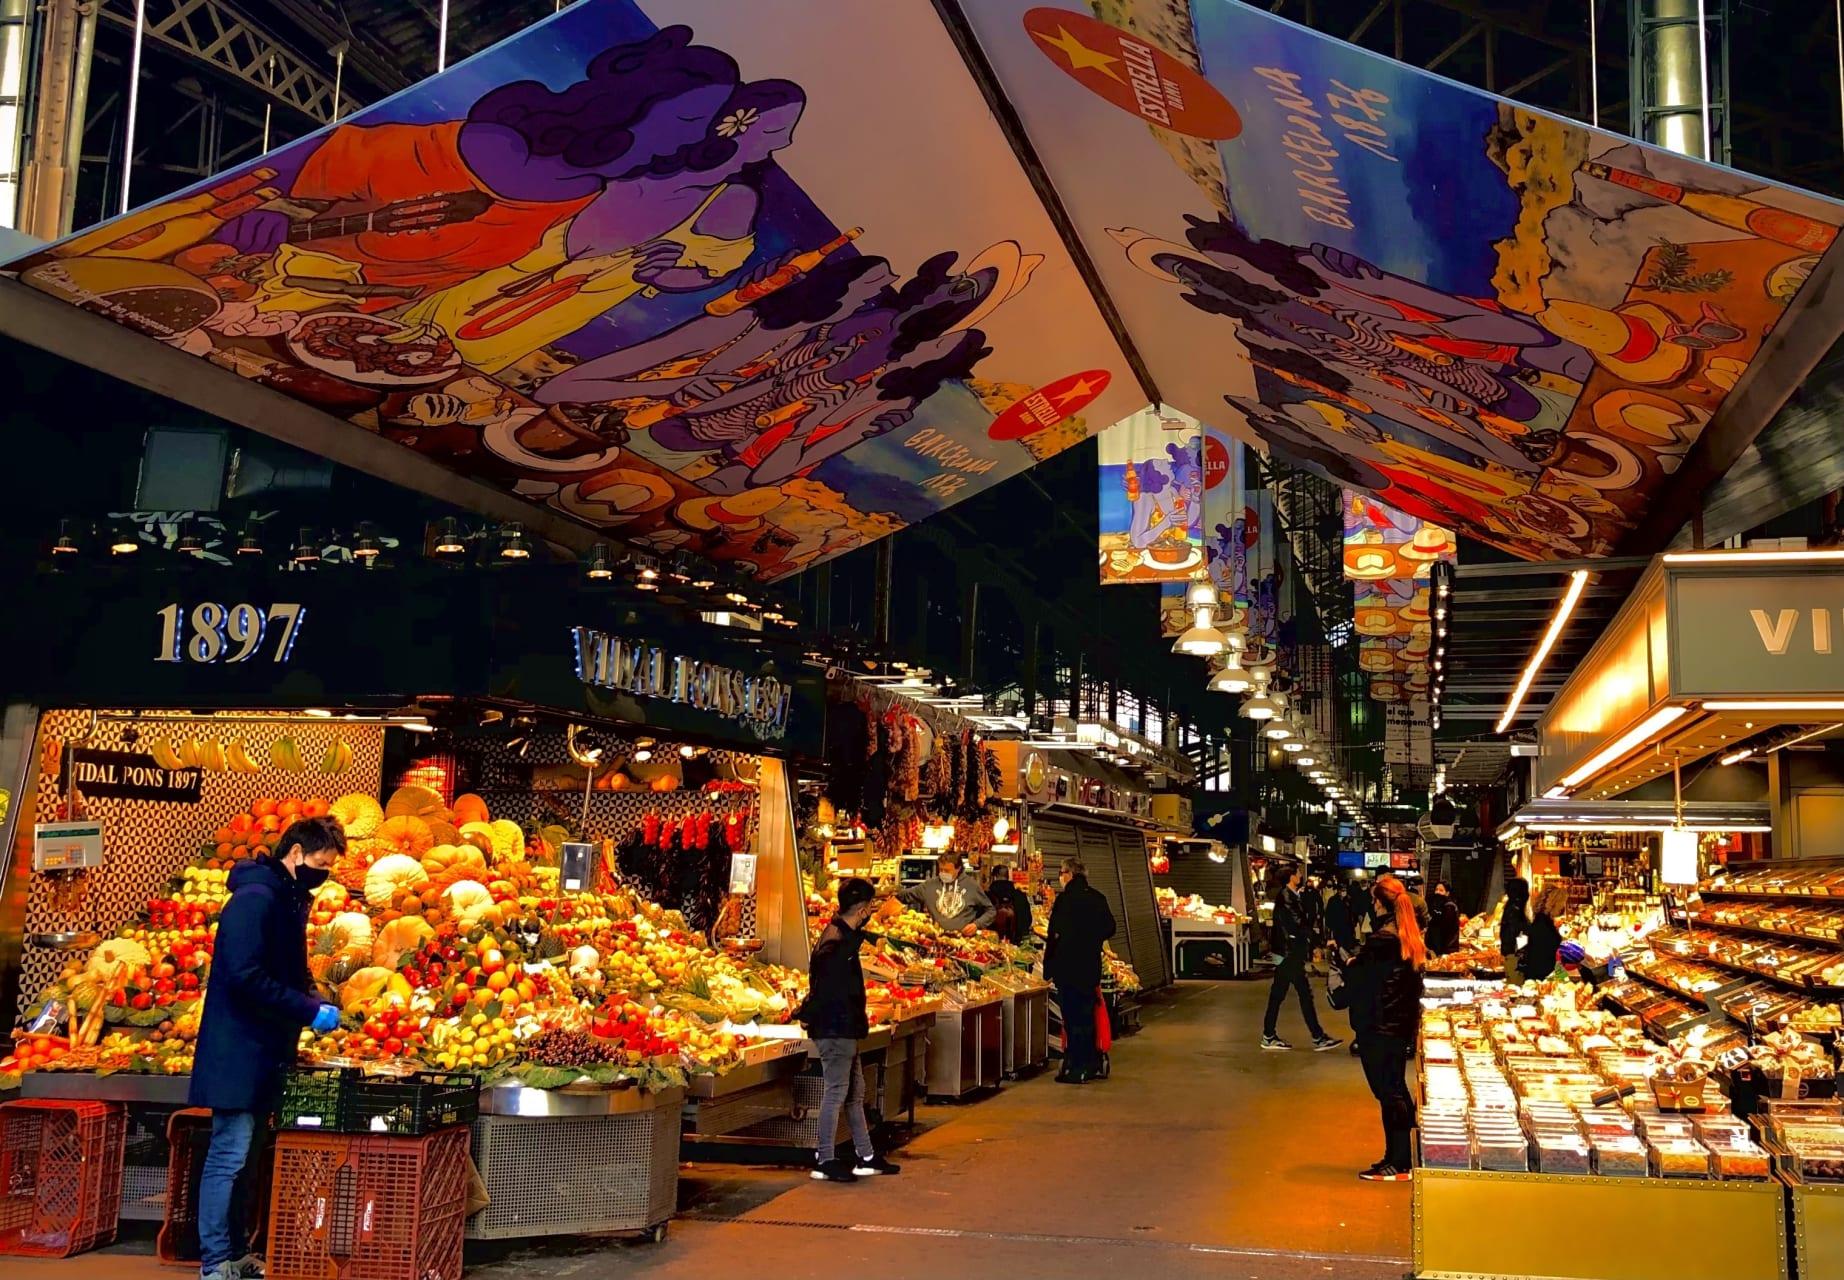 Barcelona - The Boqueria Food Market Experience